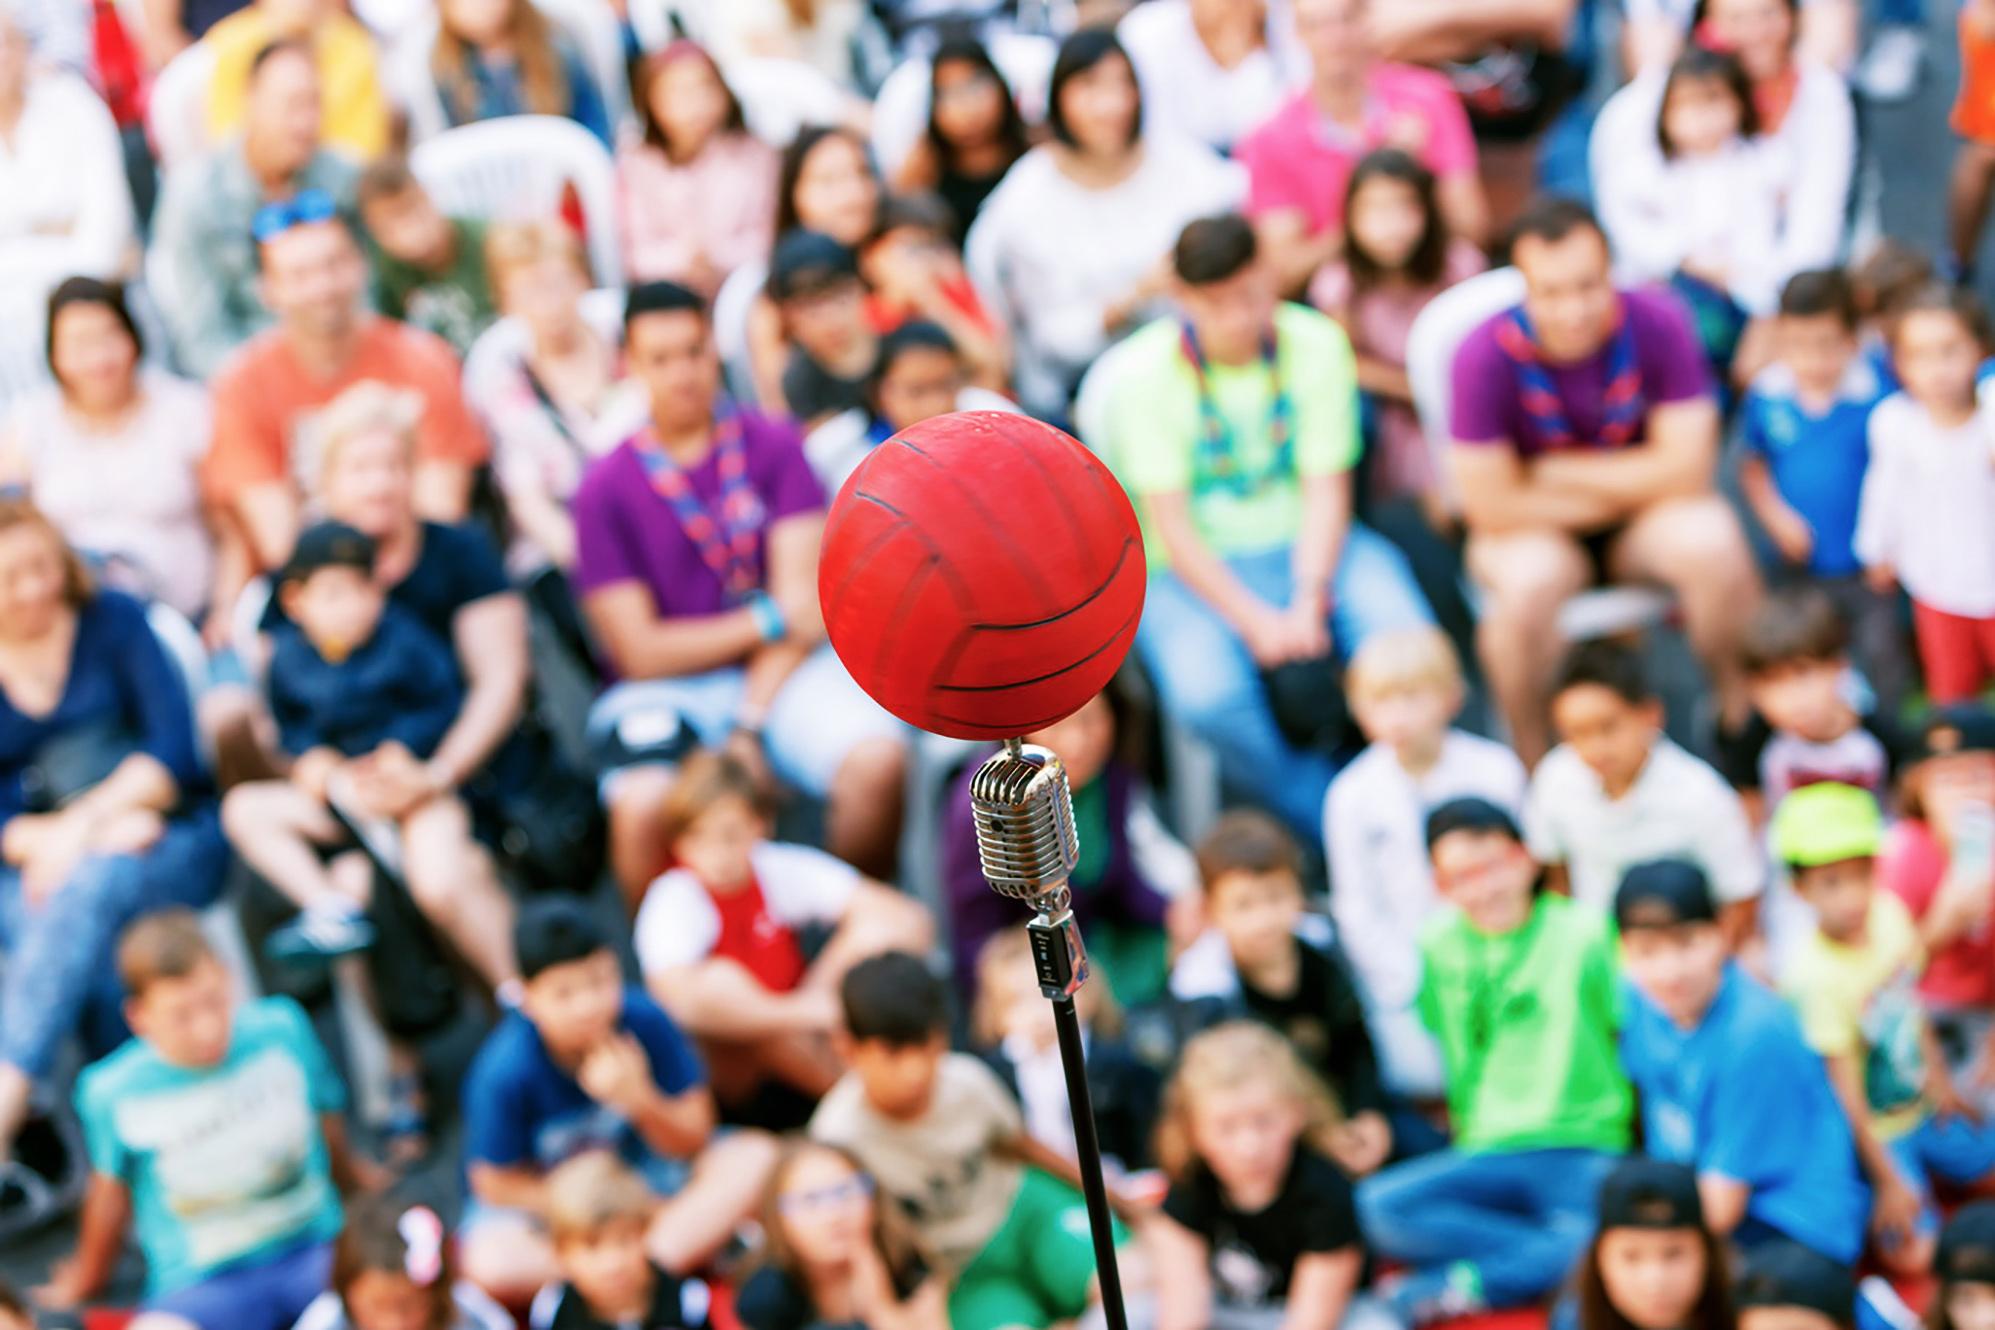 mic-spining-publico-lbdo2